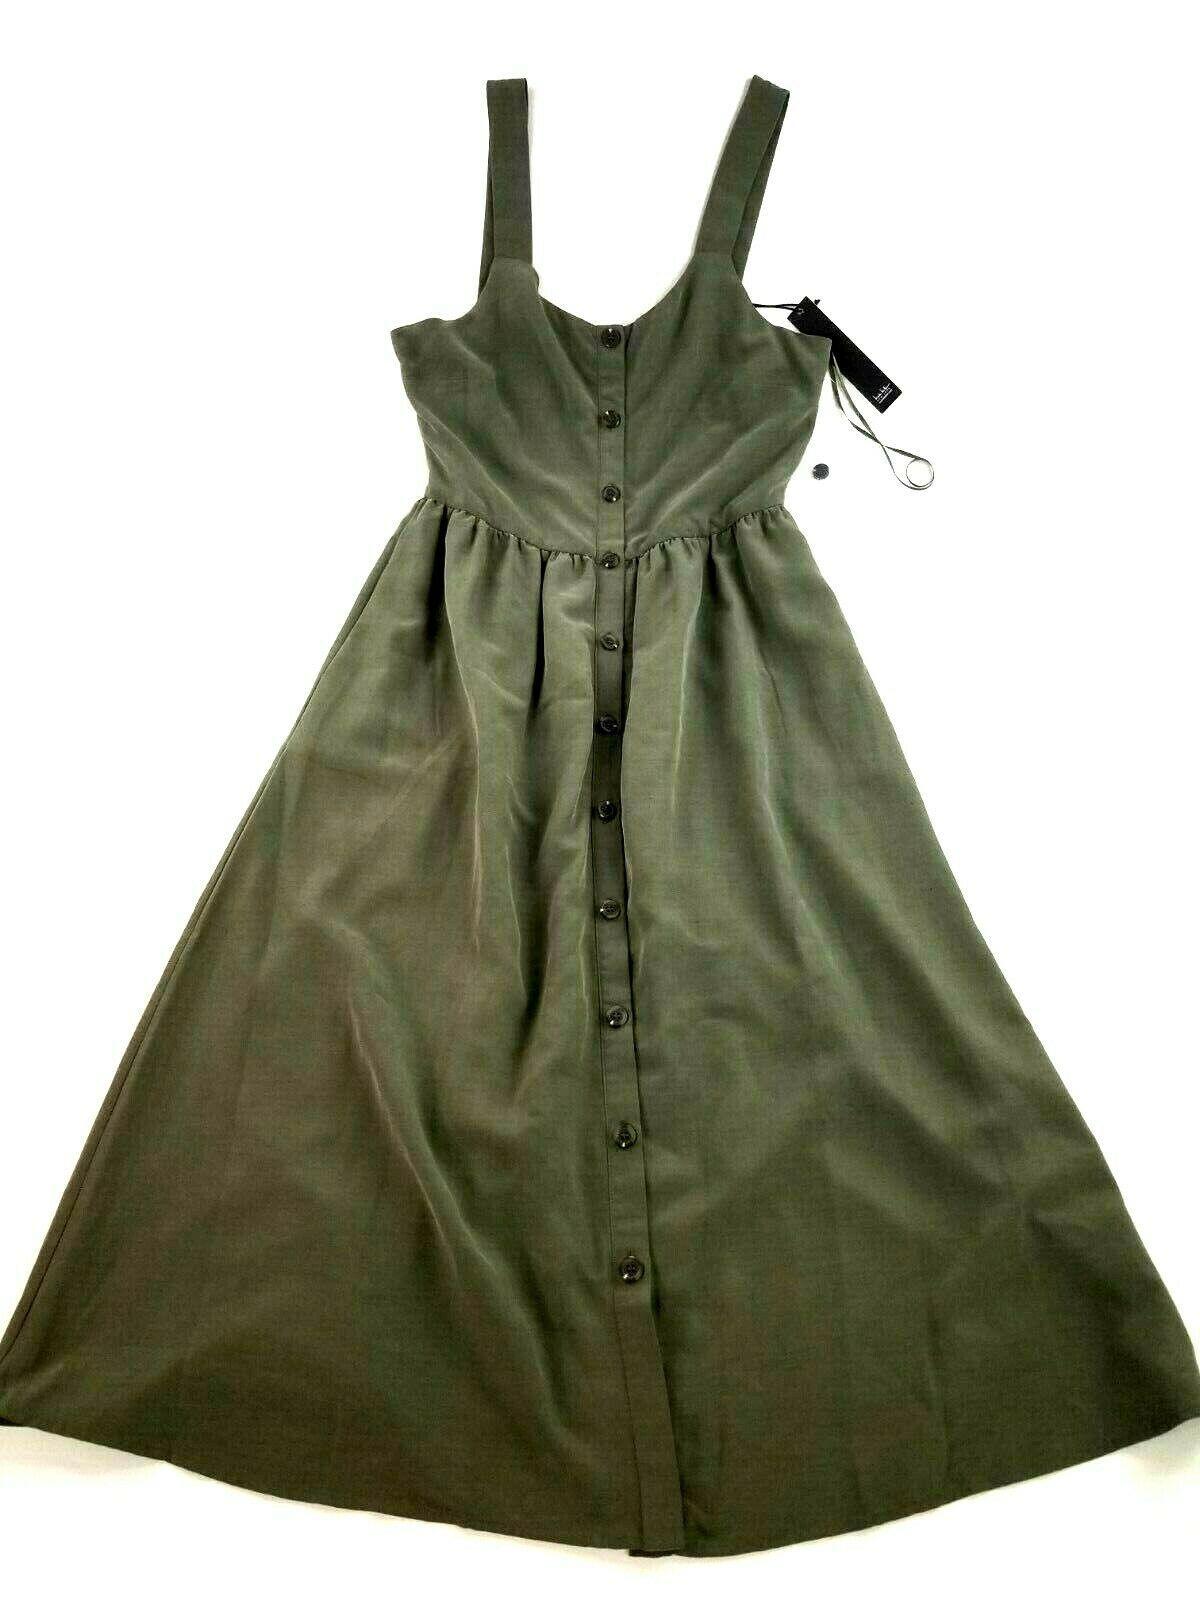 Nicole Miller New York Paillette-Trim Strapless Cocktail Dress Sz 2,4,10 NWT